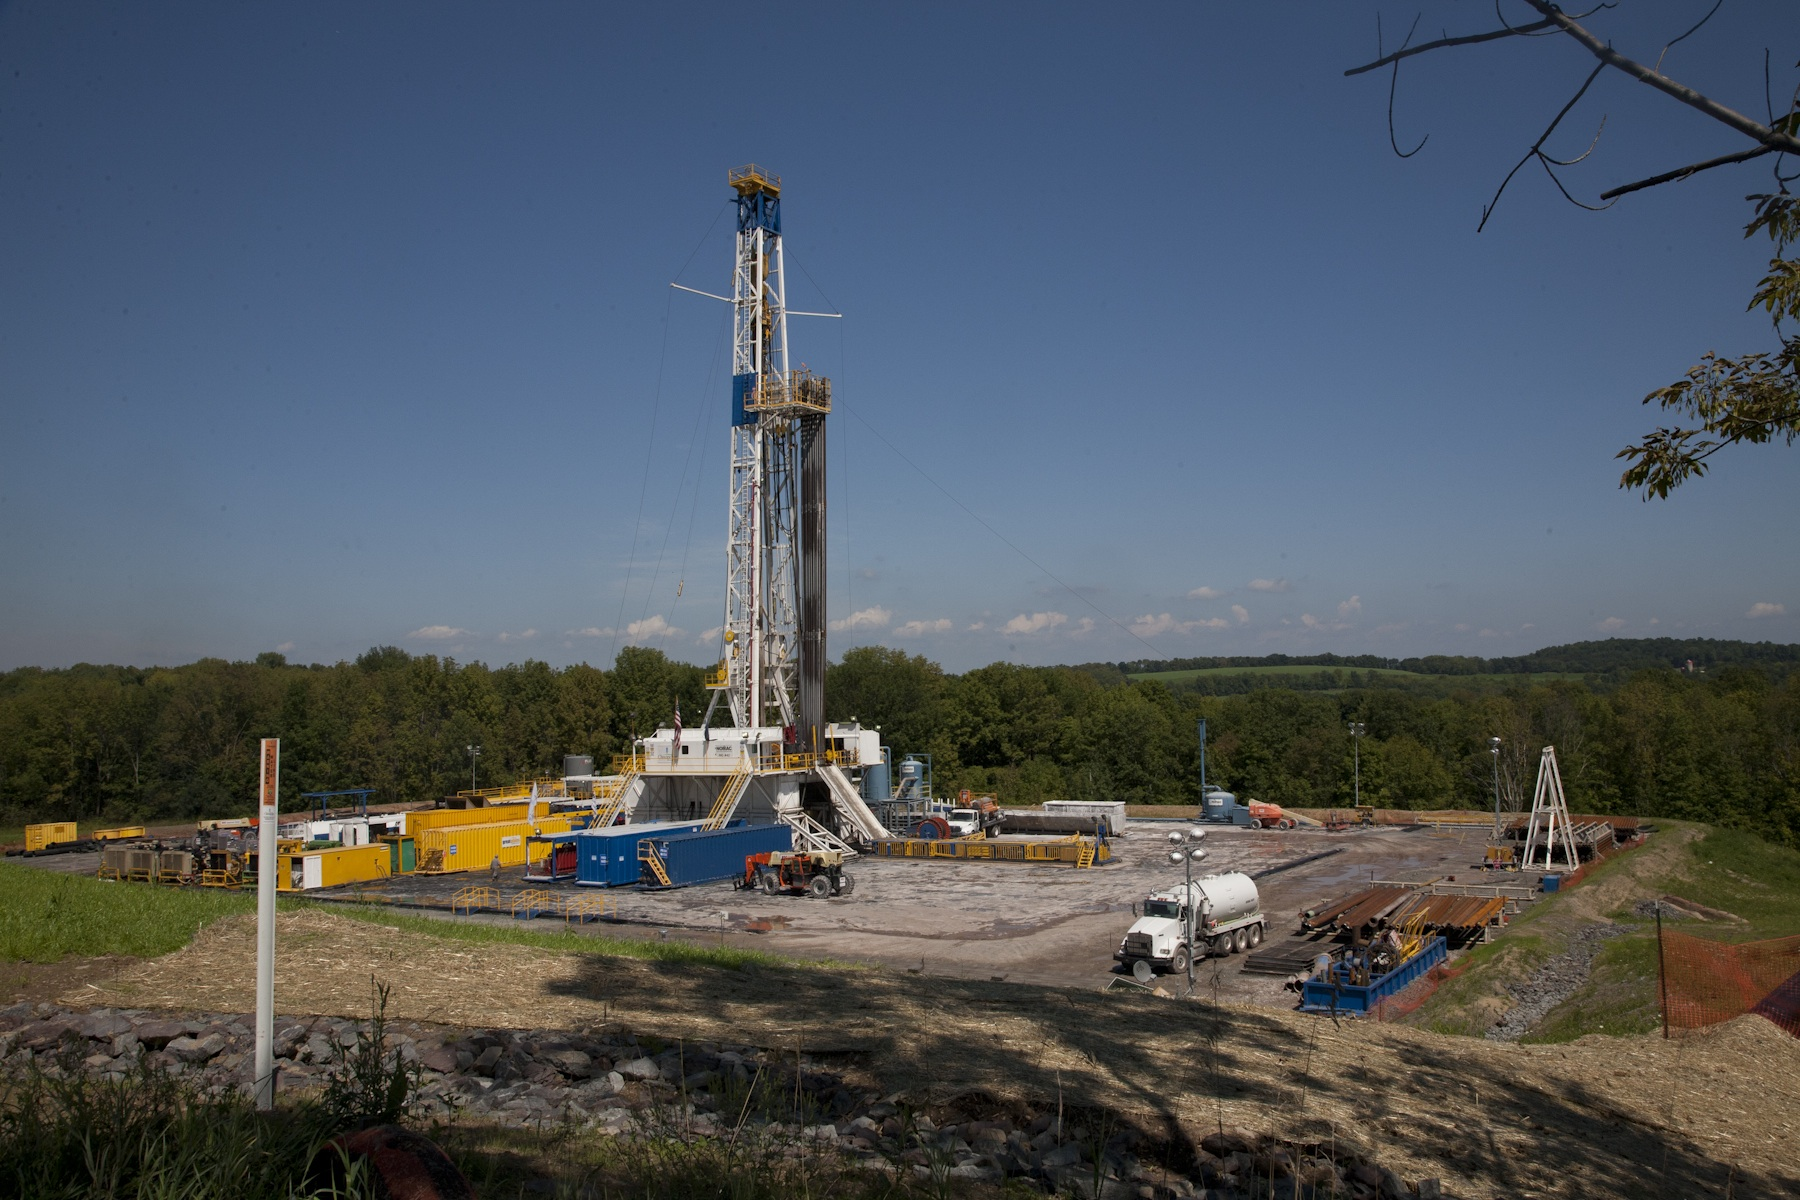 https://i2.wp.com/appvoices.org/images/uploads/2012/08/fracking-rig.jpg